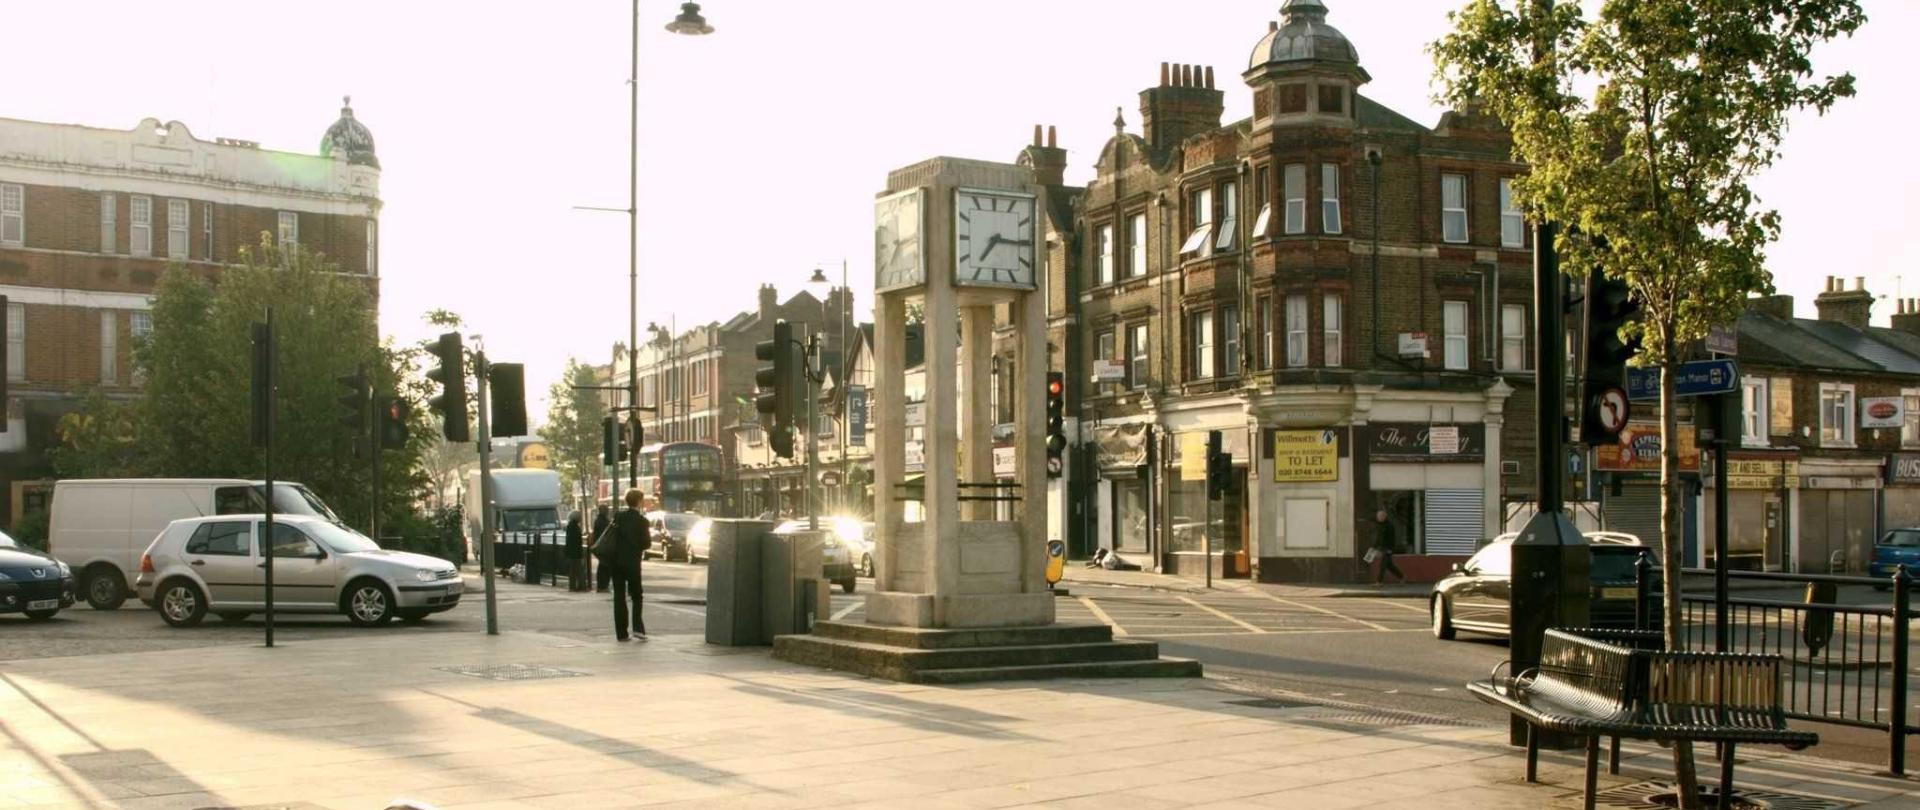 _hanwell-ealing-clock-tower.jpg